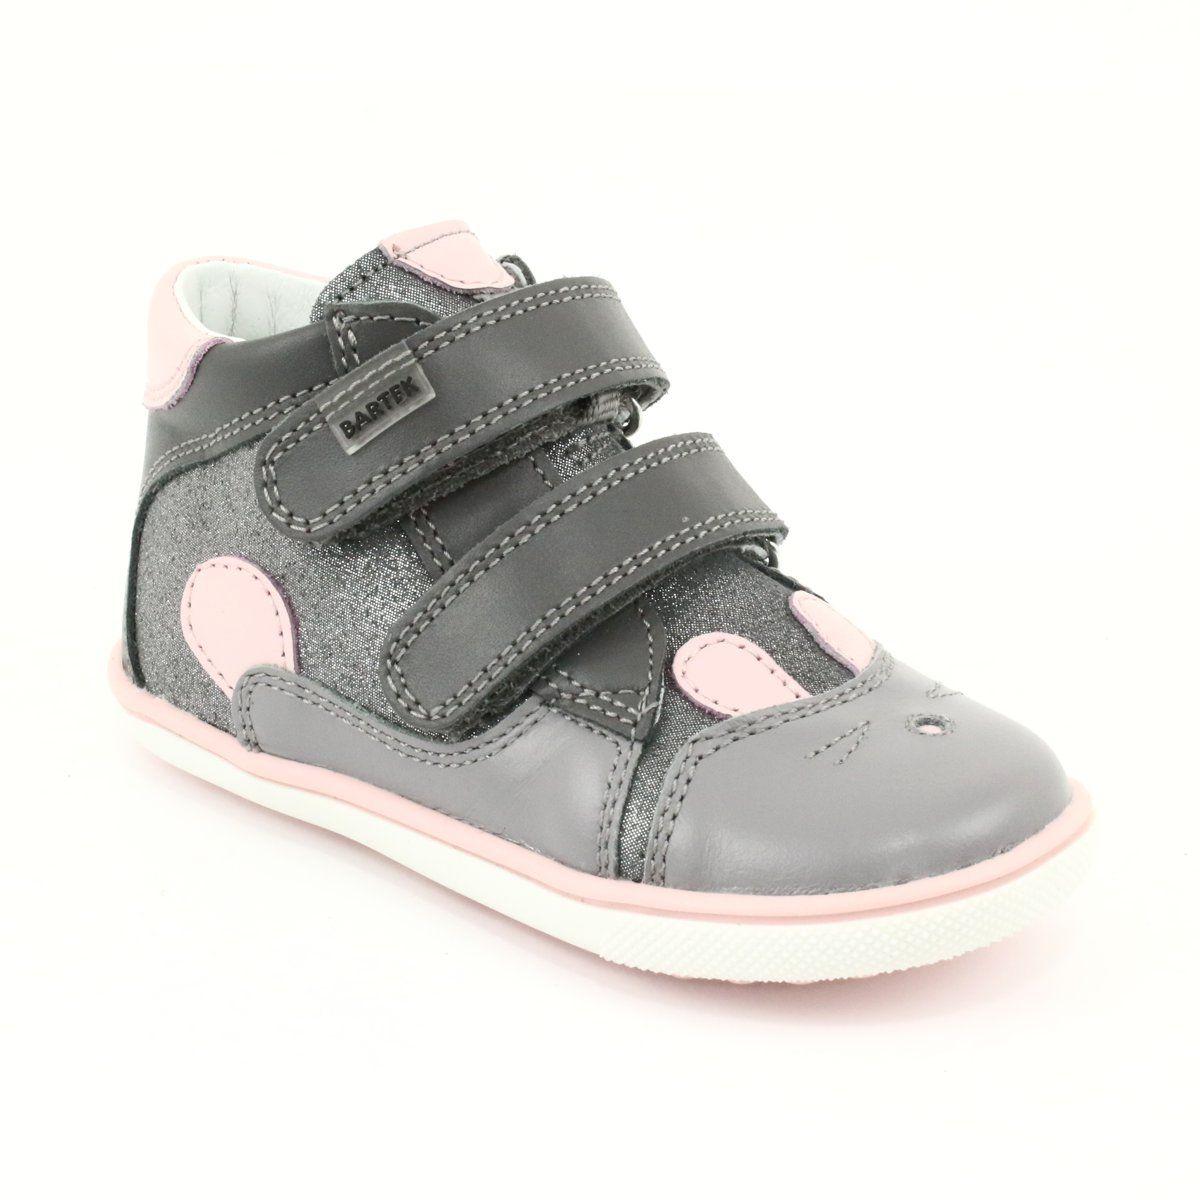 Trzewiki Na Rzepy Krolik Bartek 11702 Rozowe Szare Baby Shoes Wedge Sneaker Shoes